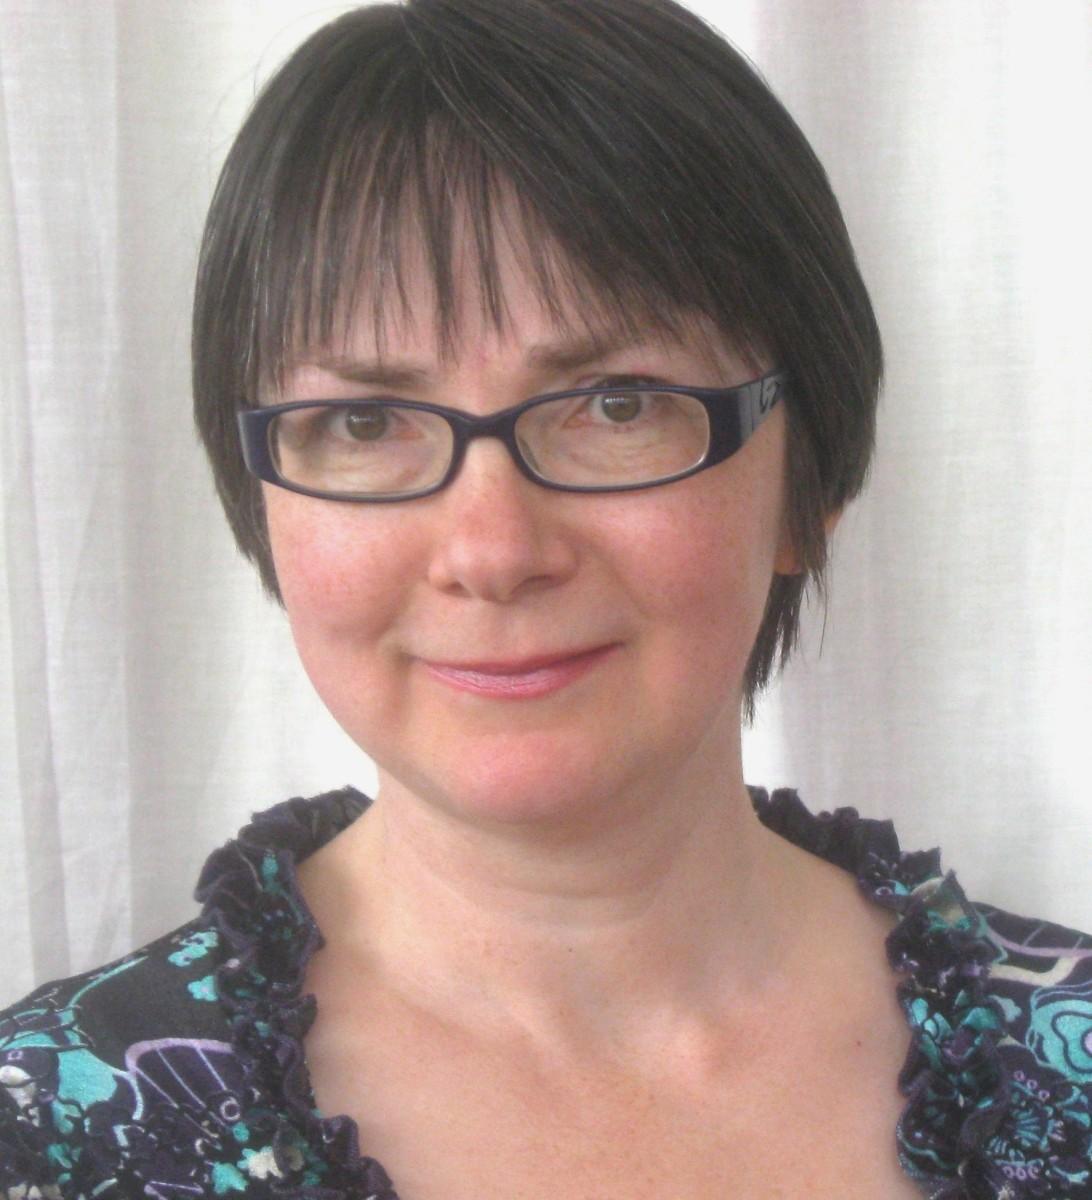 Clare Lana O'Farrell